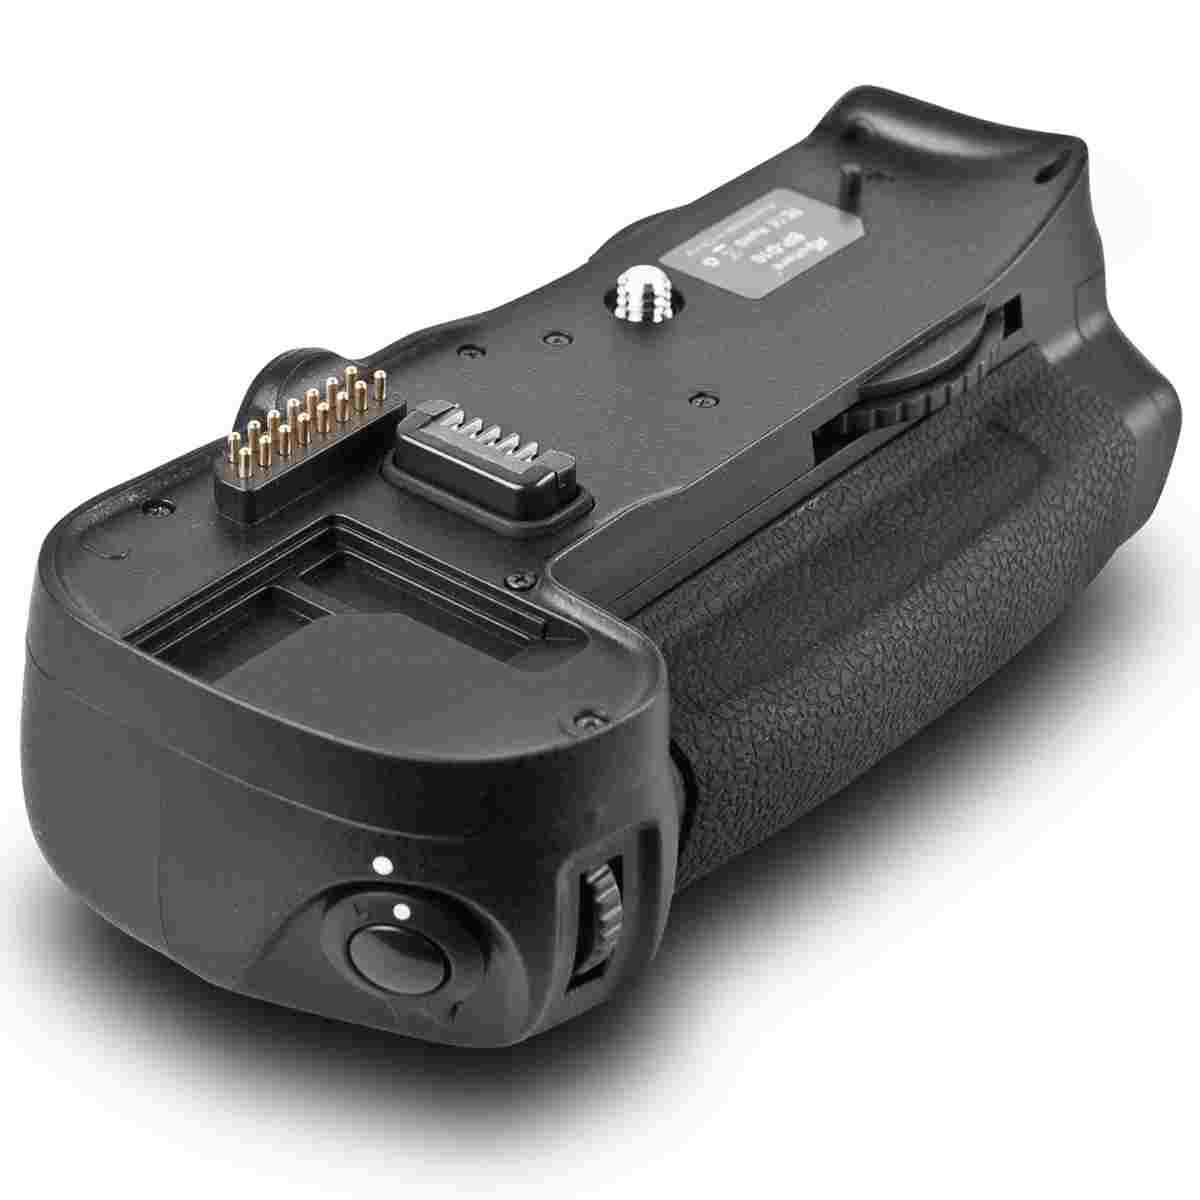 Battery Grip BP-D10 for Nikon D700